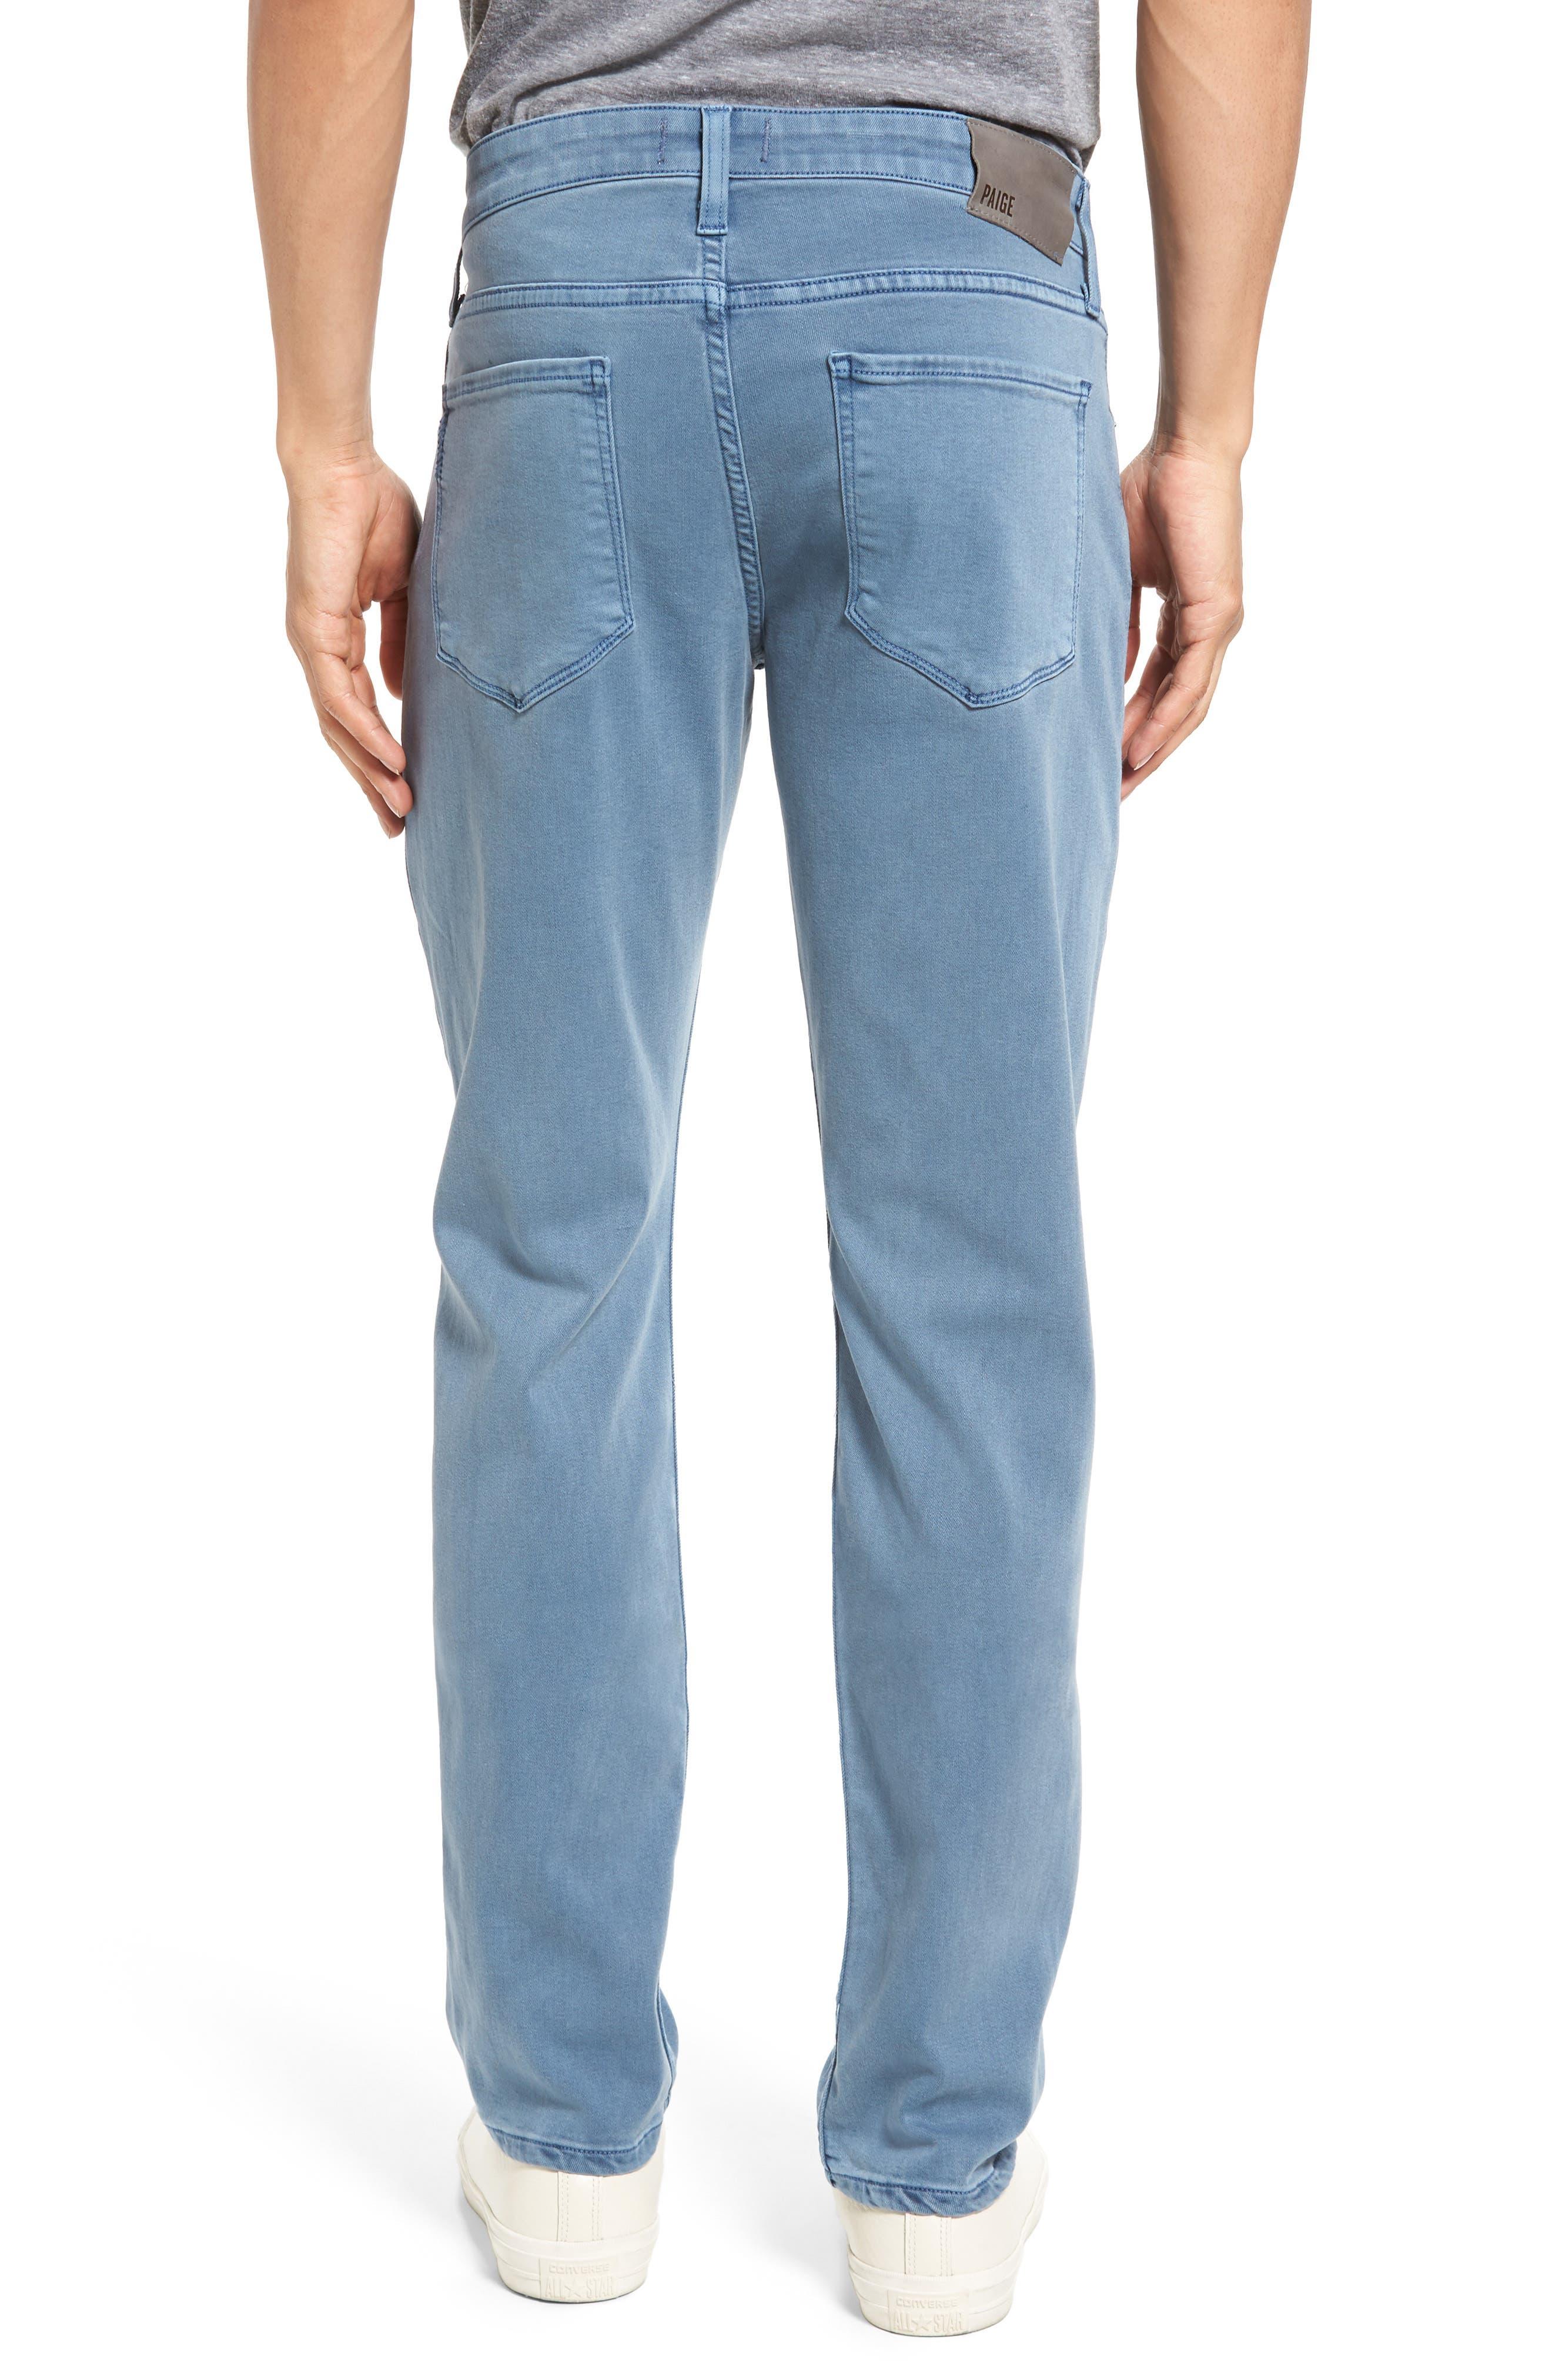 Transcend - Lennox Slim Fit Jeans,                             Alternate thumbnail 2, color,